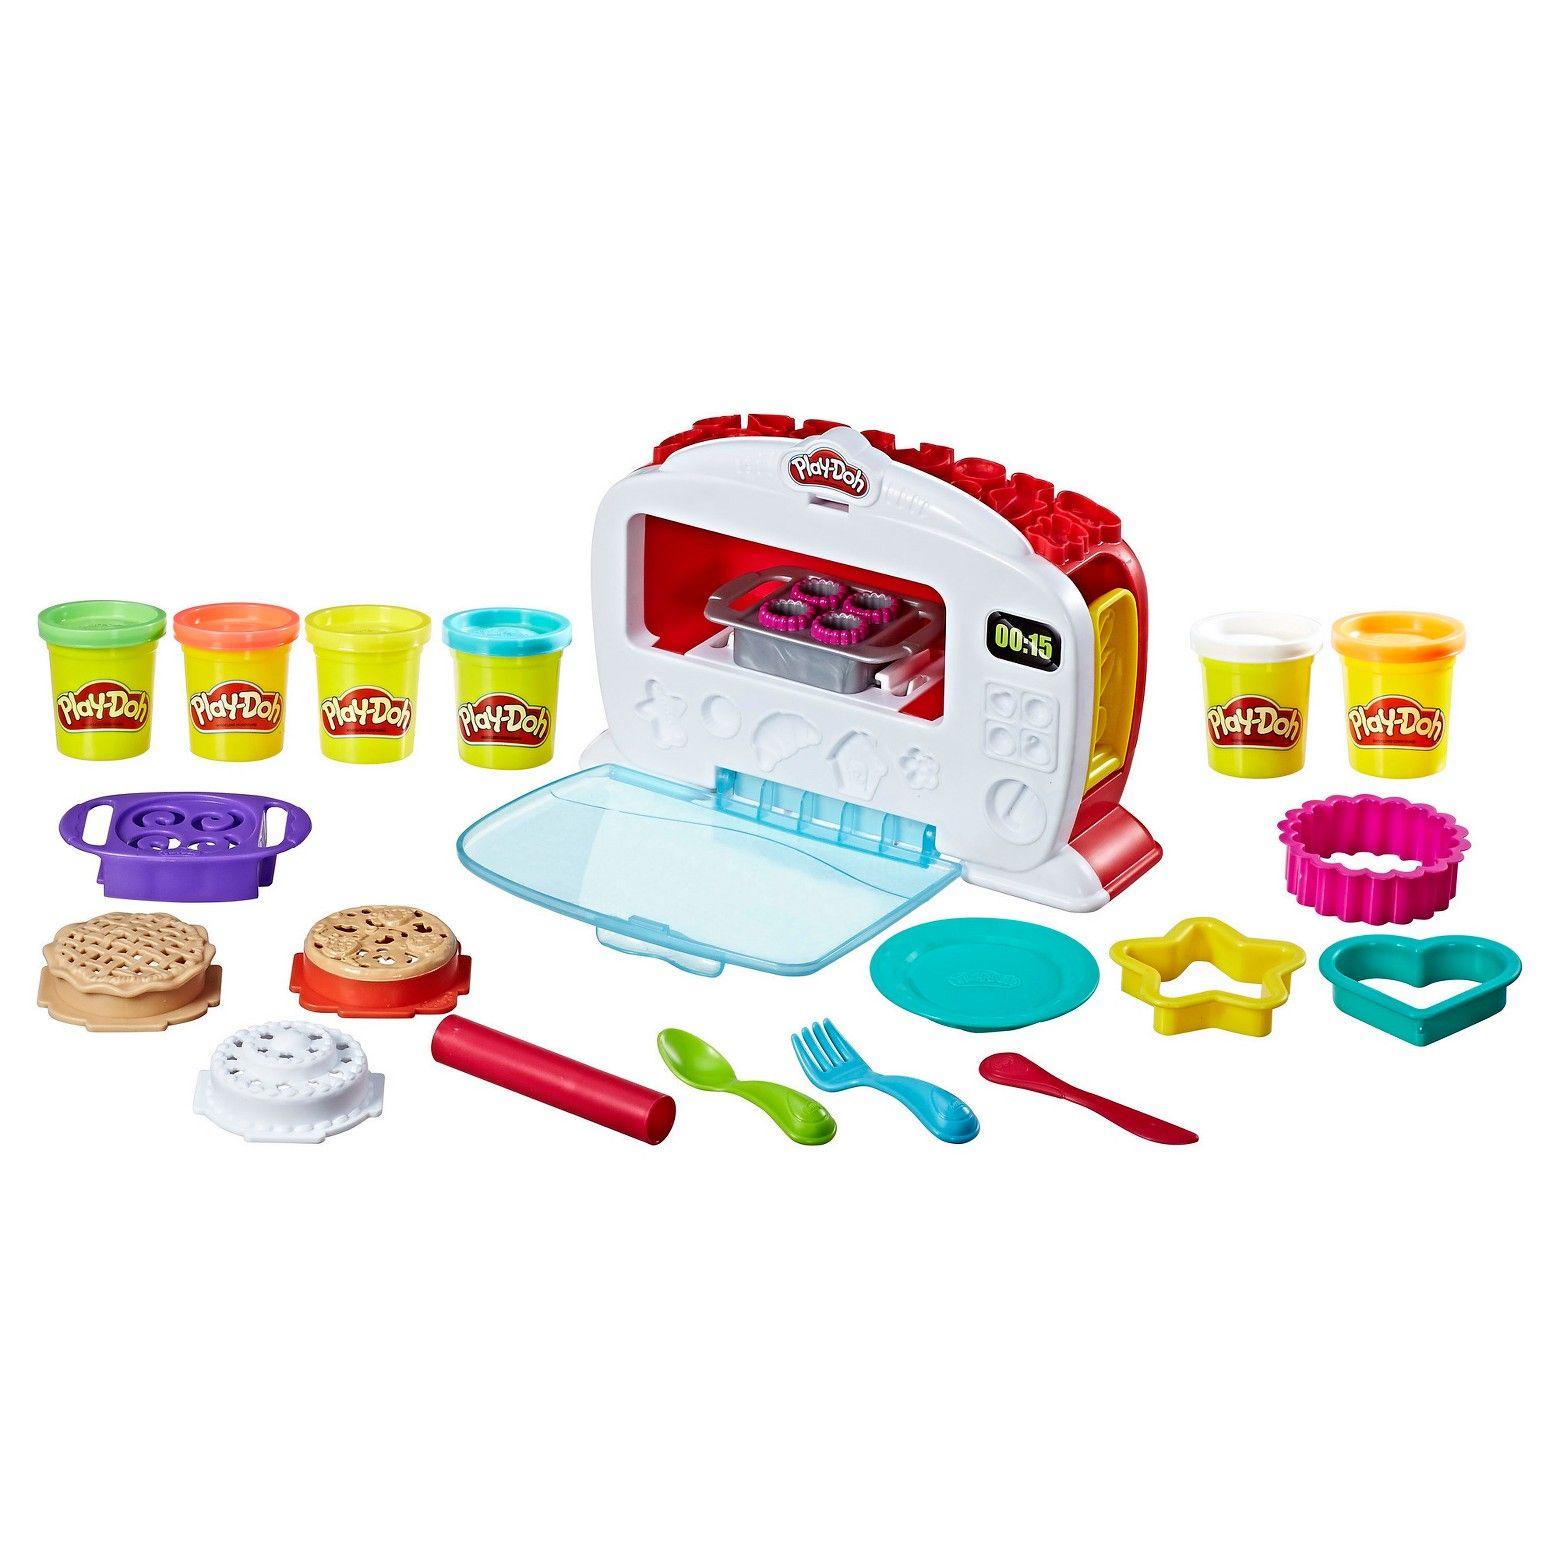 8 yr old boy hairstyles playdoh kitchen creations magical oven  play doh kitchen play doh